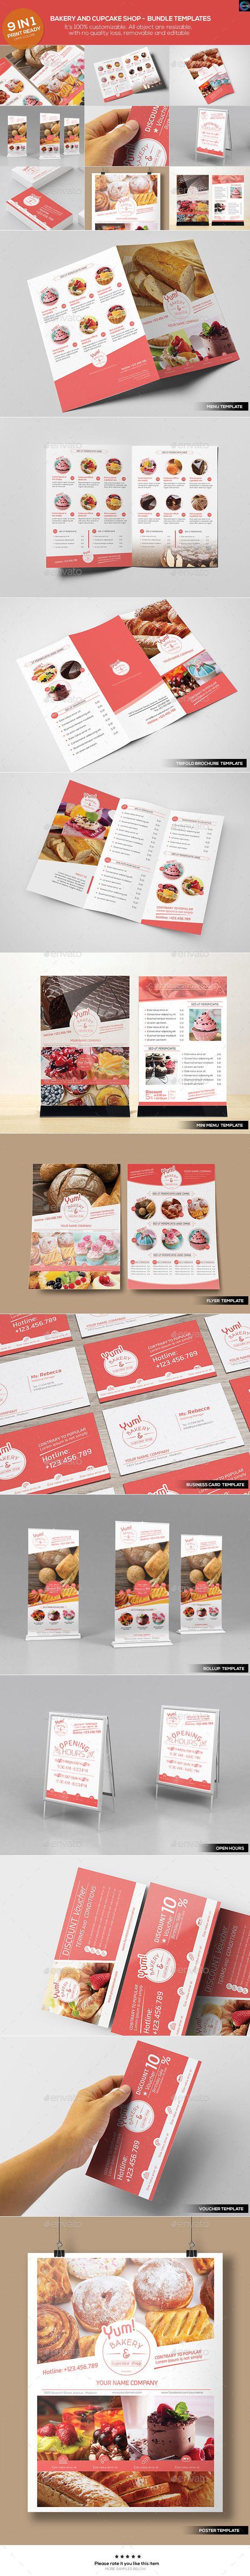 Bakery & Cupcake Shop - Bundle Template #design Download: http://graphicriver.net/item/bakery-cupcake-shop-bundle-templates/12664182?ref=ksioks